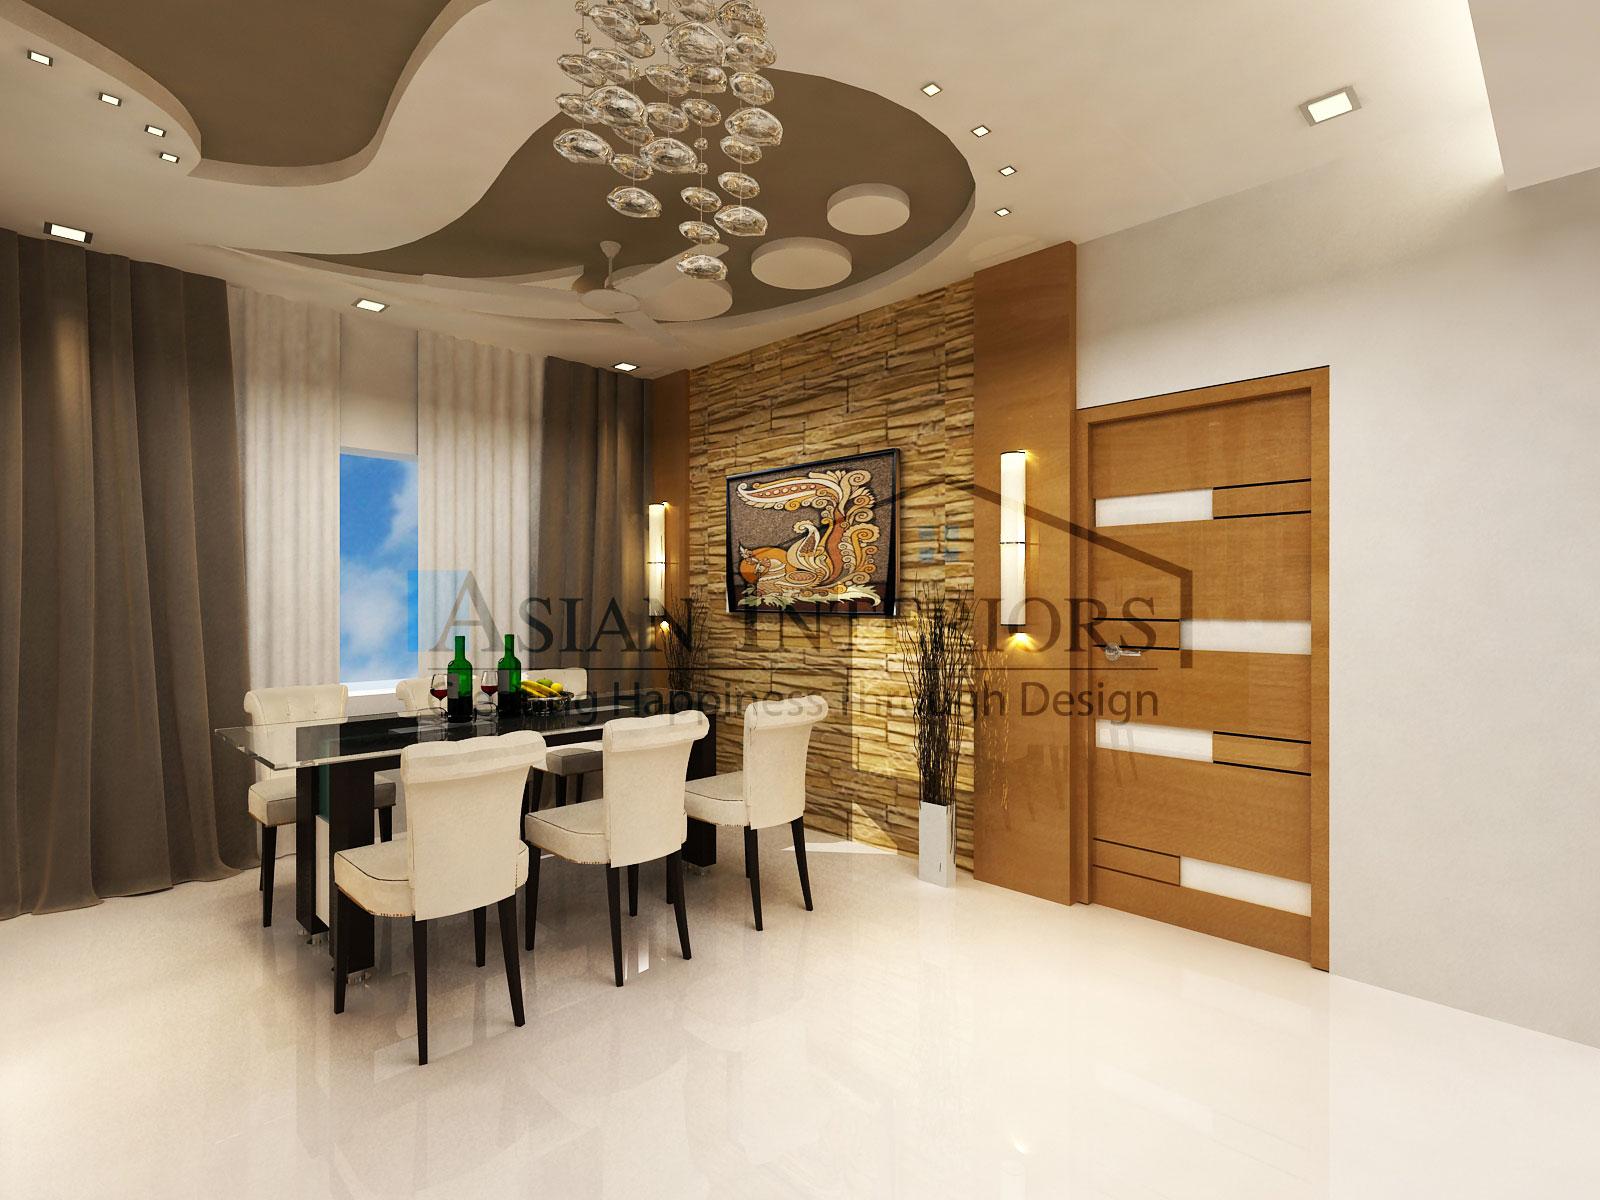 Asian-Interiors-DrawingRoom17